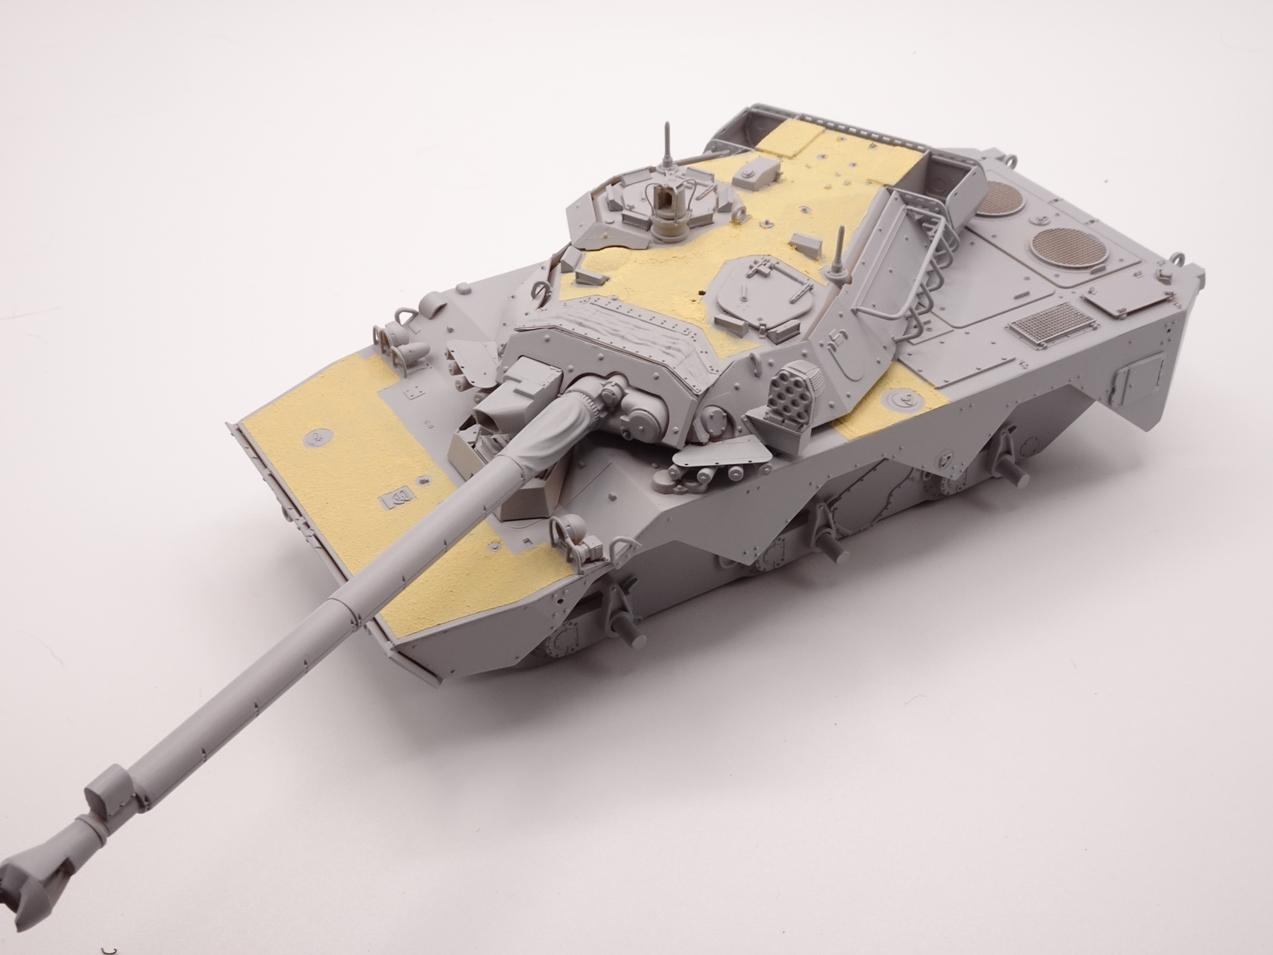 [Tiger Model] AMX-10RCR réf. 4602 - 1/35 - Page 3 Amx10-2807-1